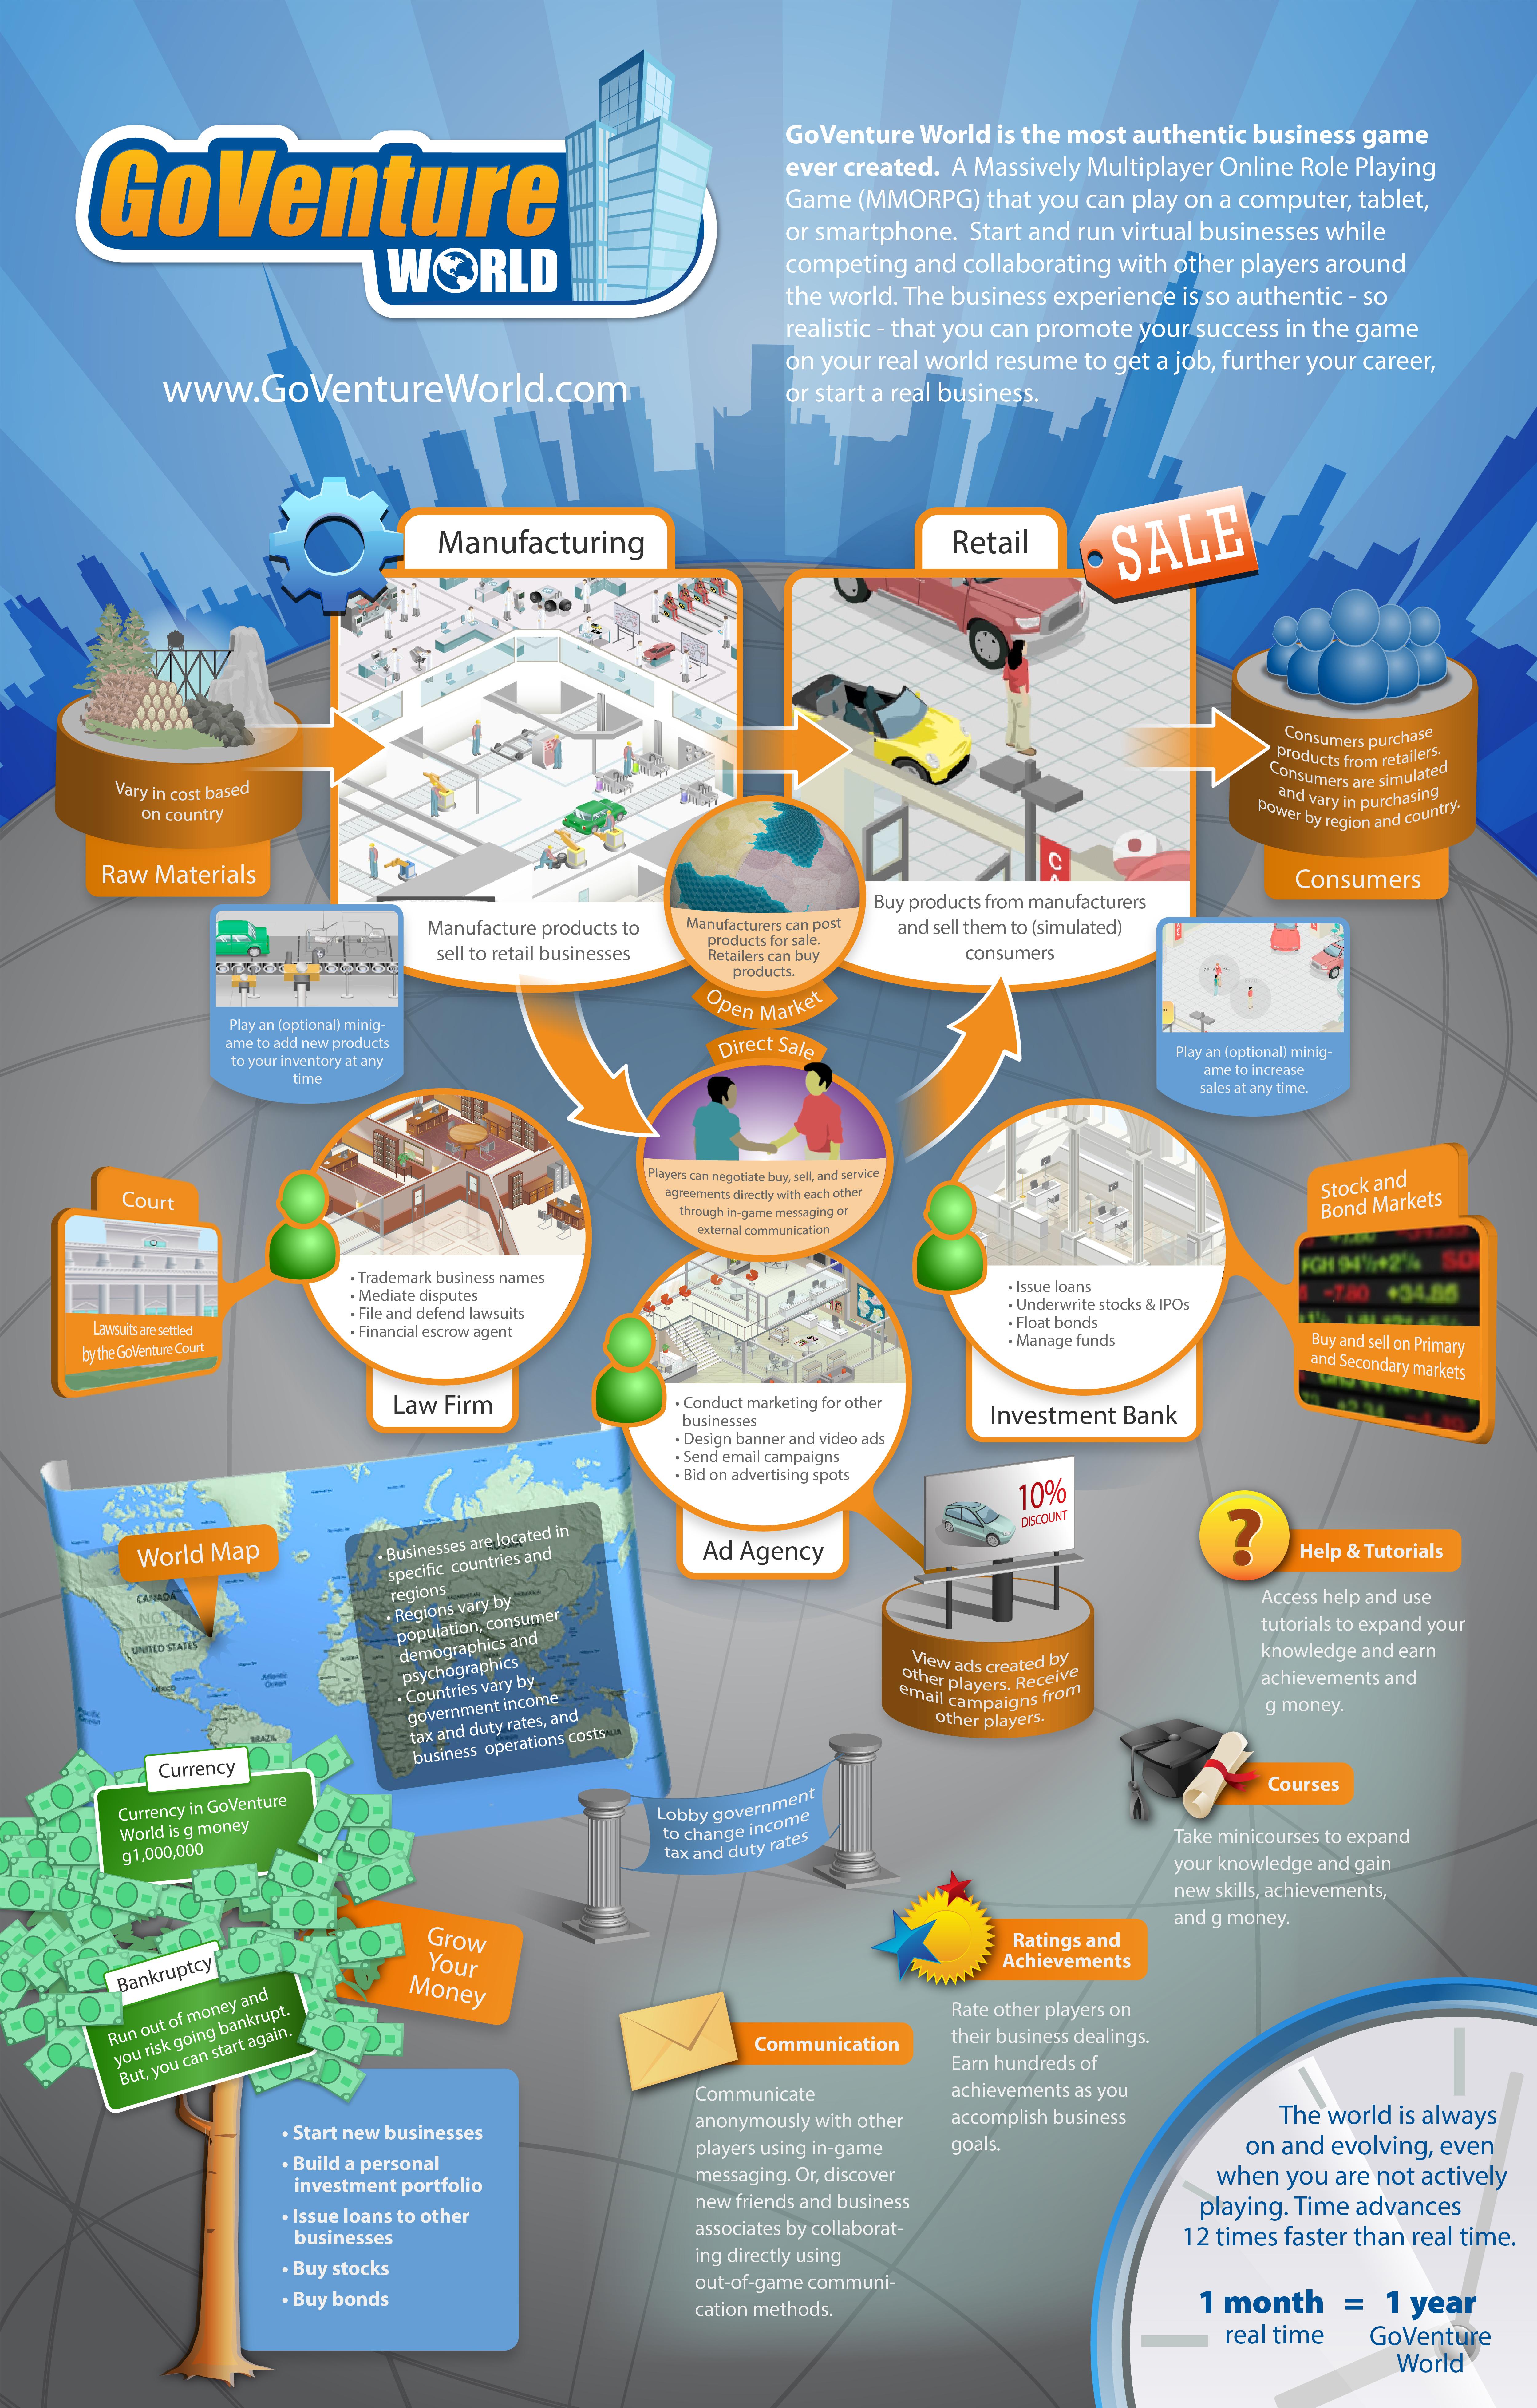 gw_infographic_highres.jpg